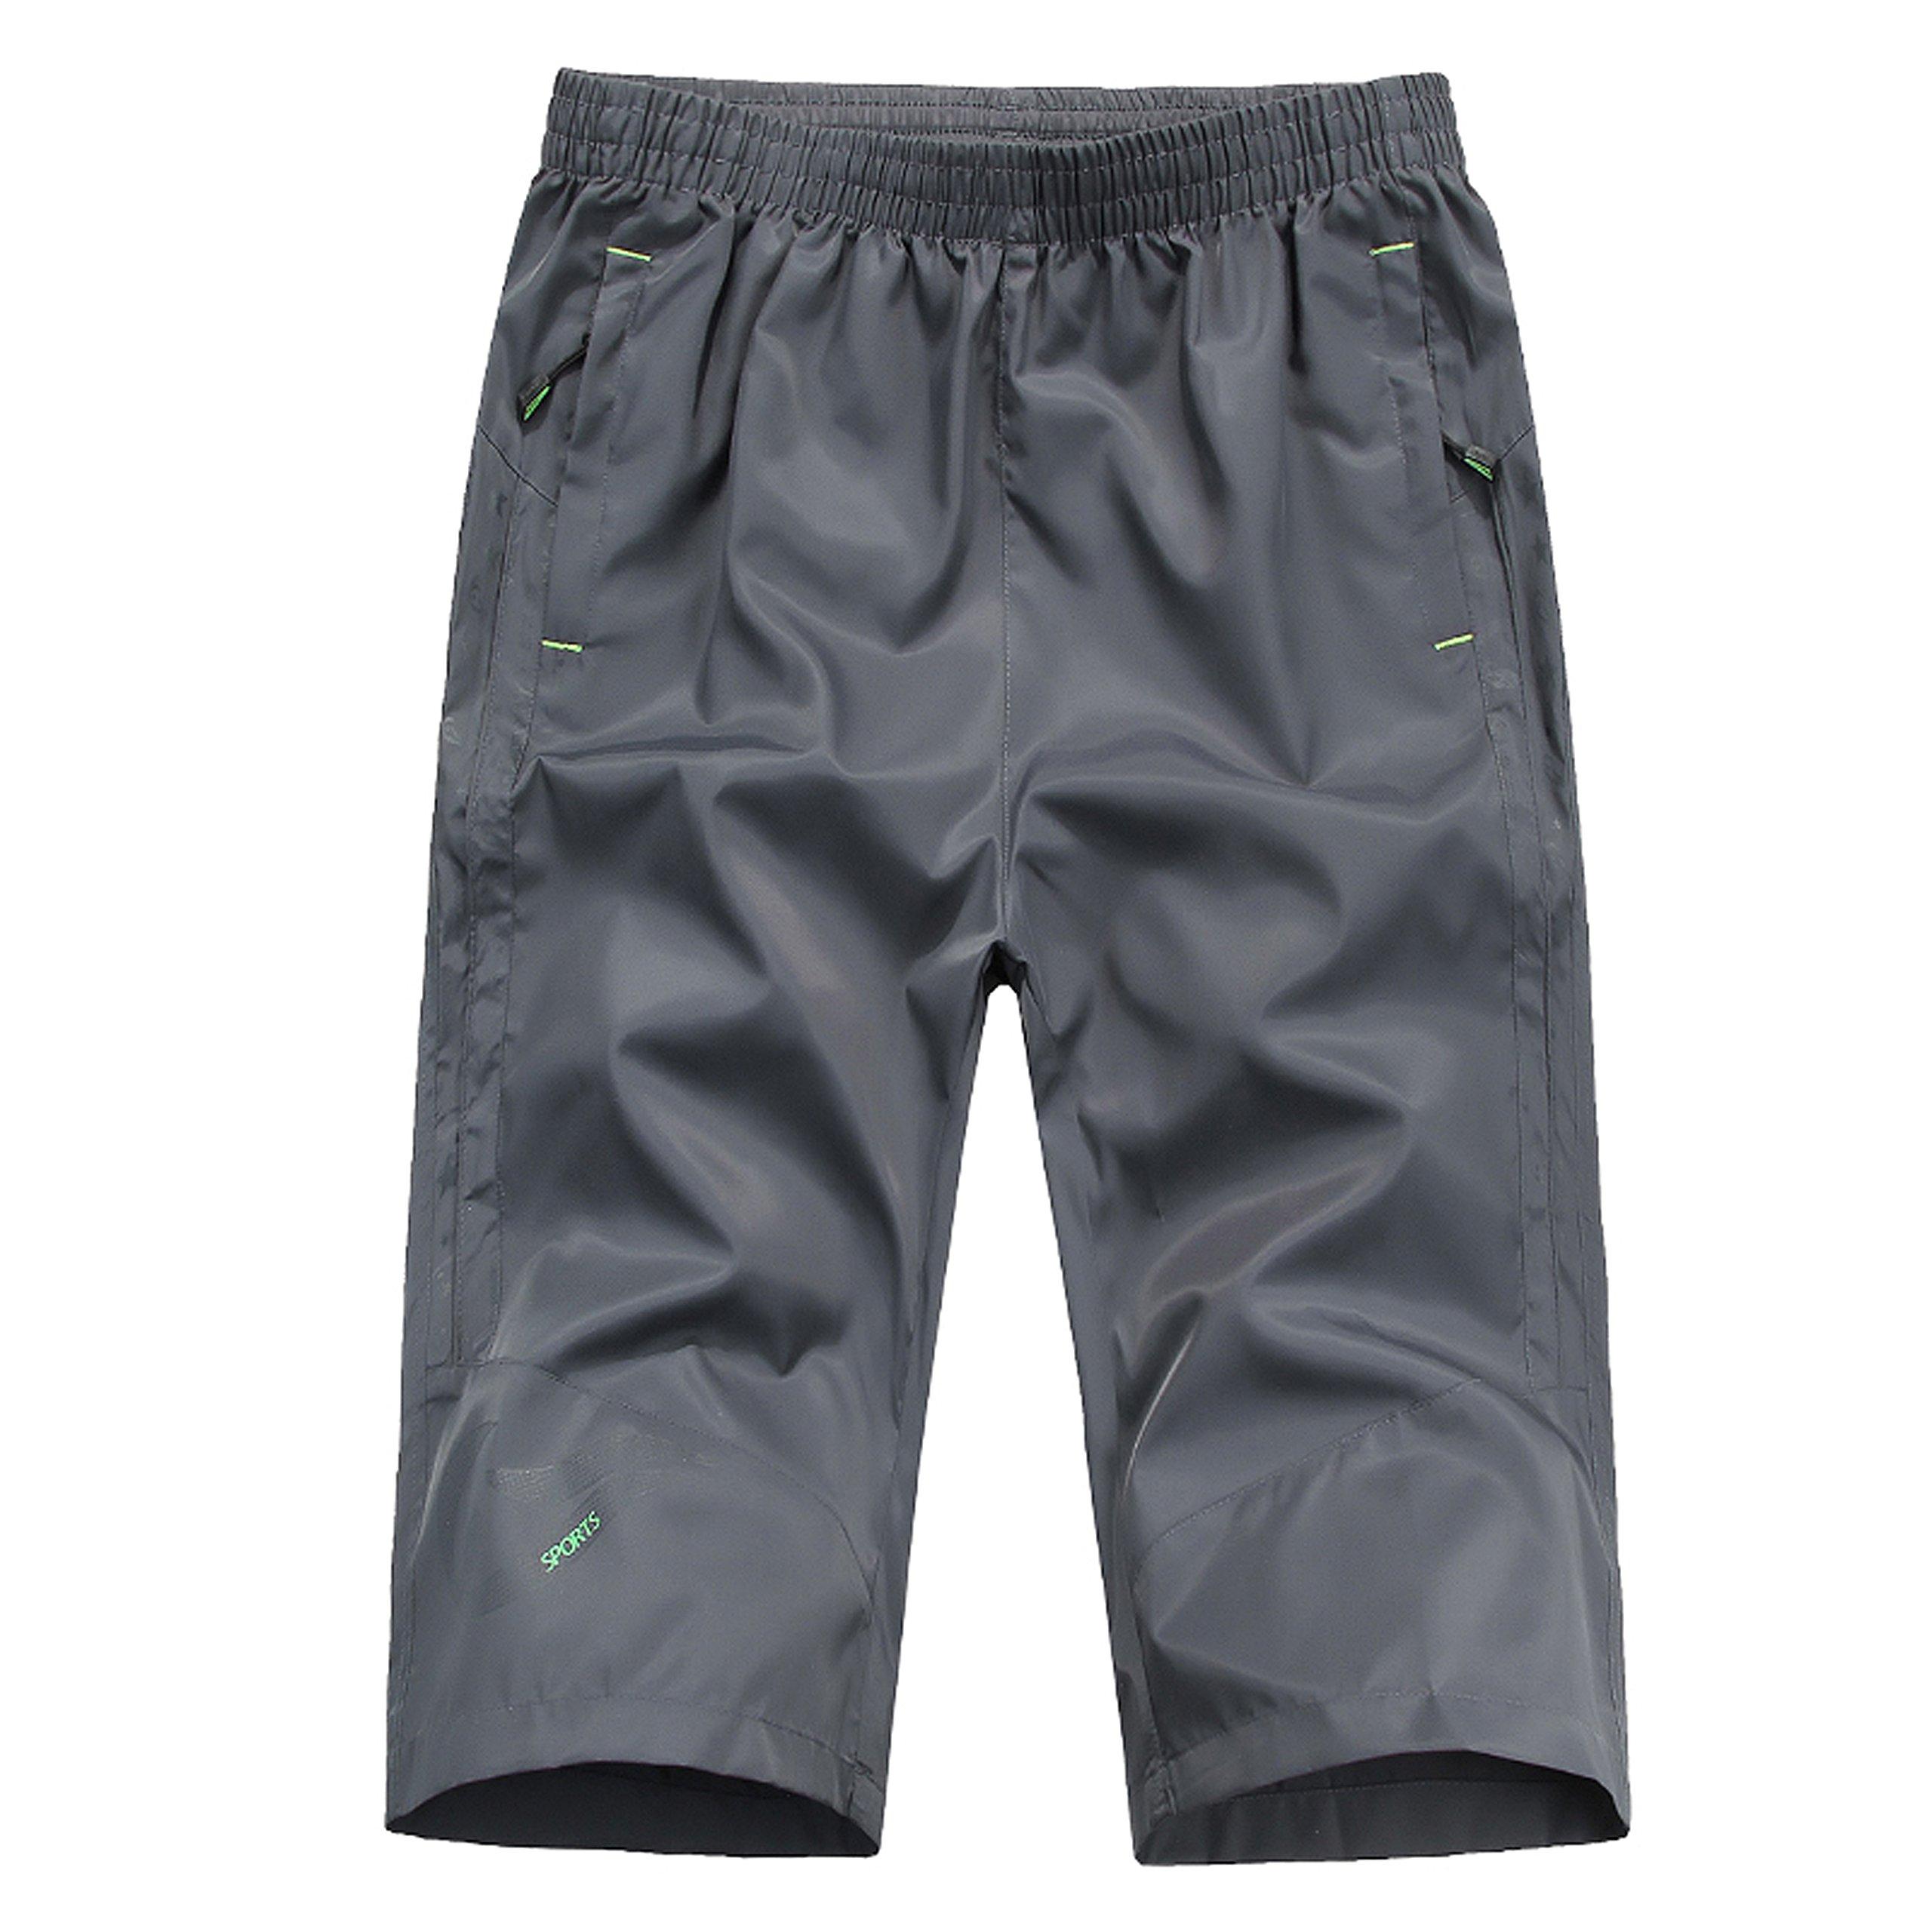 MAGNIVIT Men Shorts Jogger Shorts Quick Dry White South Wrestling Fishing Running Pants